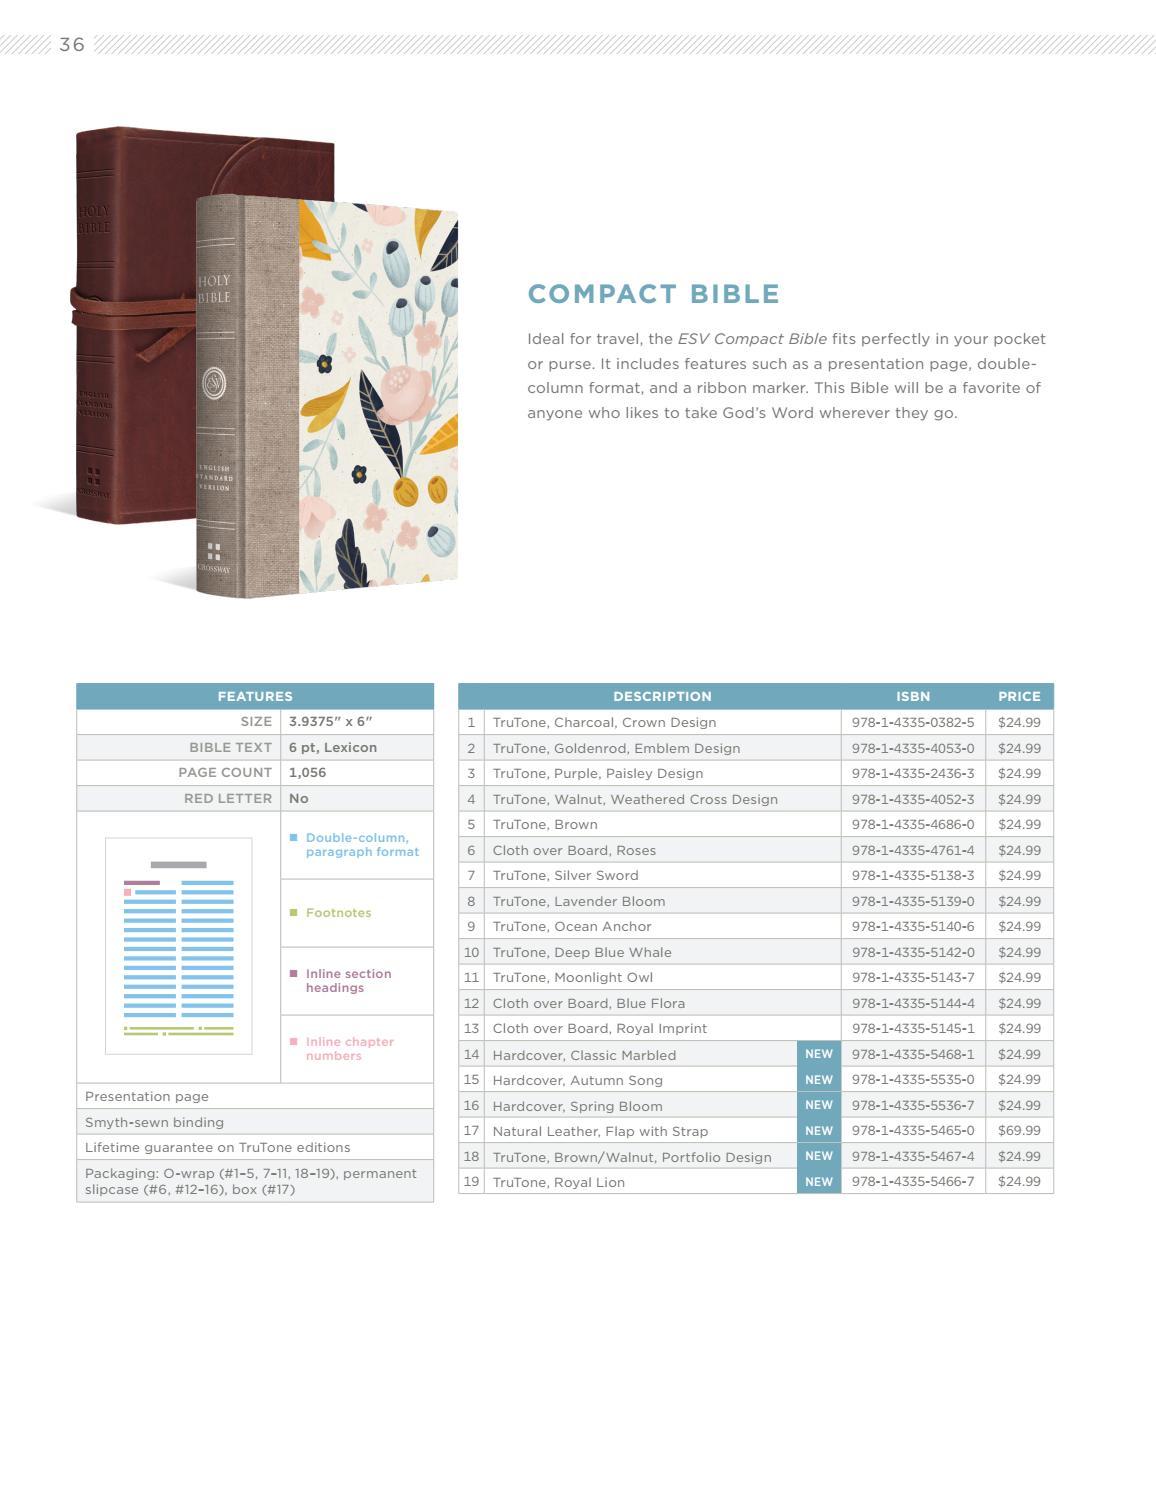 ESV Winter 2017 Bible Catalog by Crossway - issuu